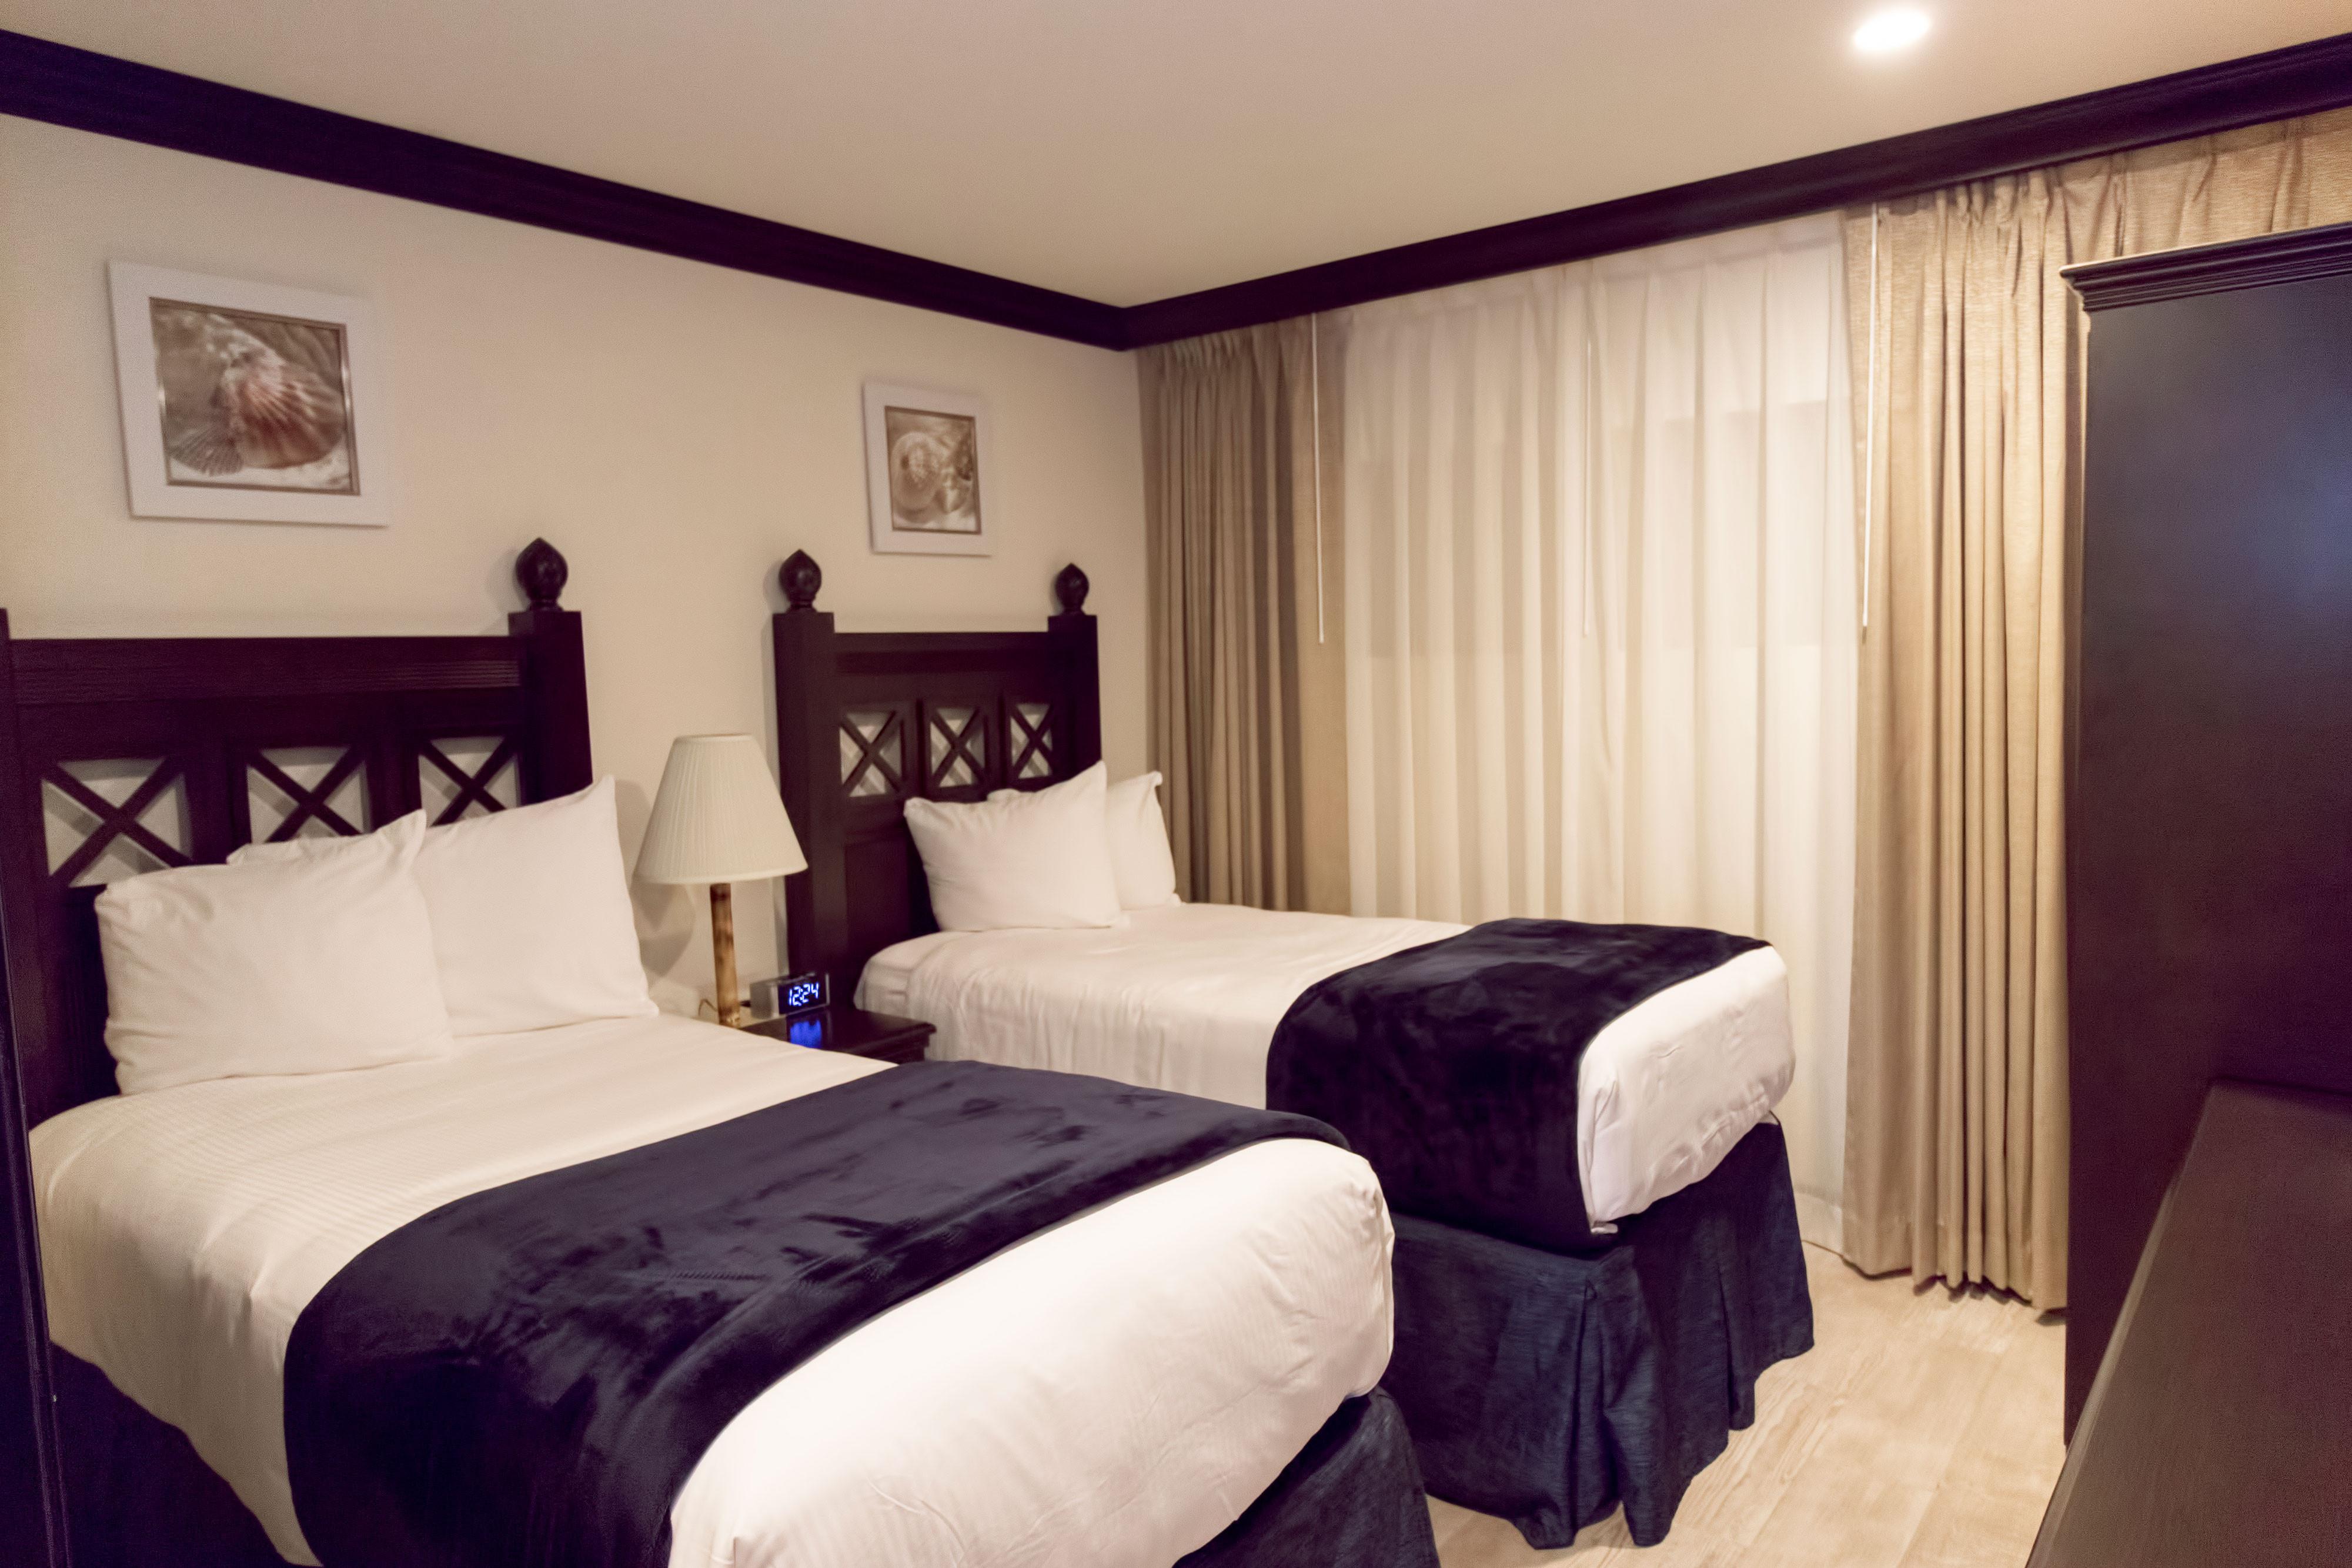 Two Beds in 2 Bedroom Deluxe Villa in our 2 Bedroom Suites in Cocoa Beach   Wakulla Suites A Westgate Resort   Westgate Resorts